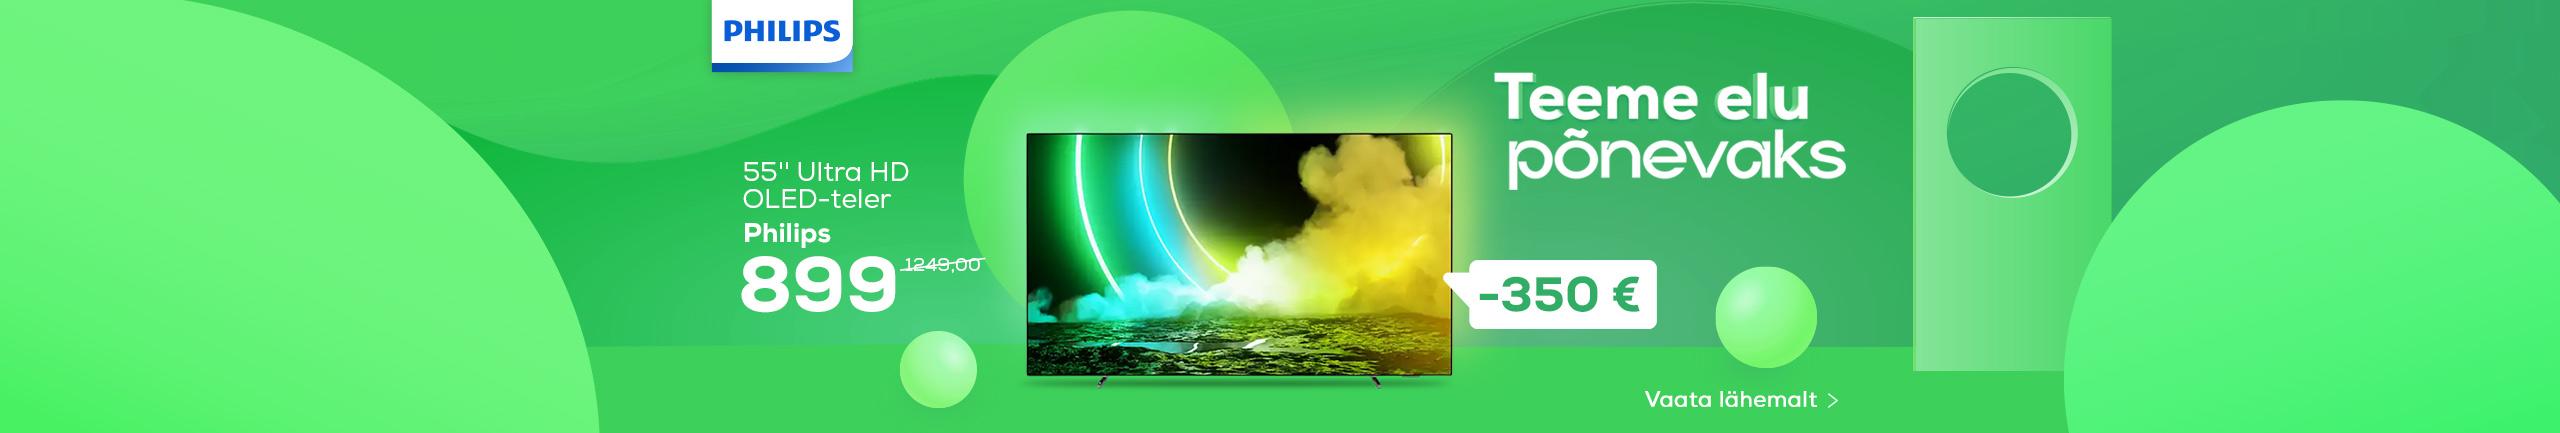 FPS Teeme elu lihtsaks, Philips TV